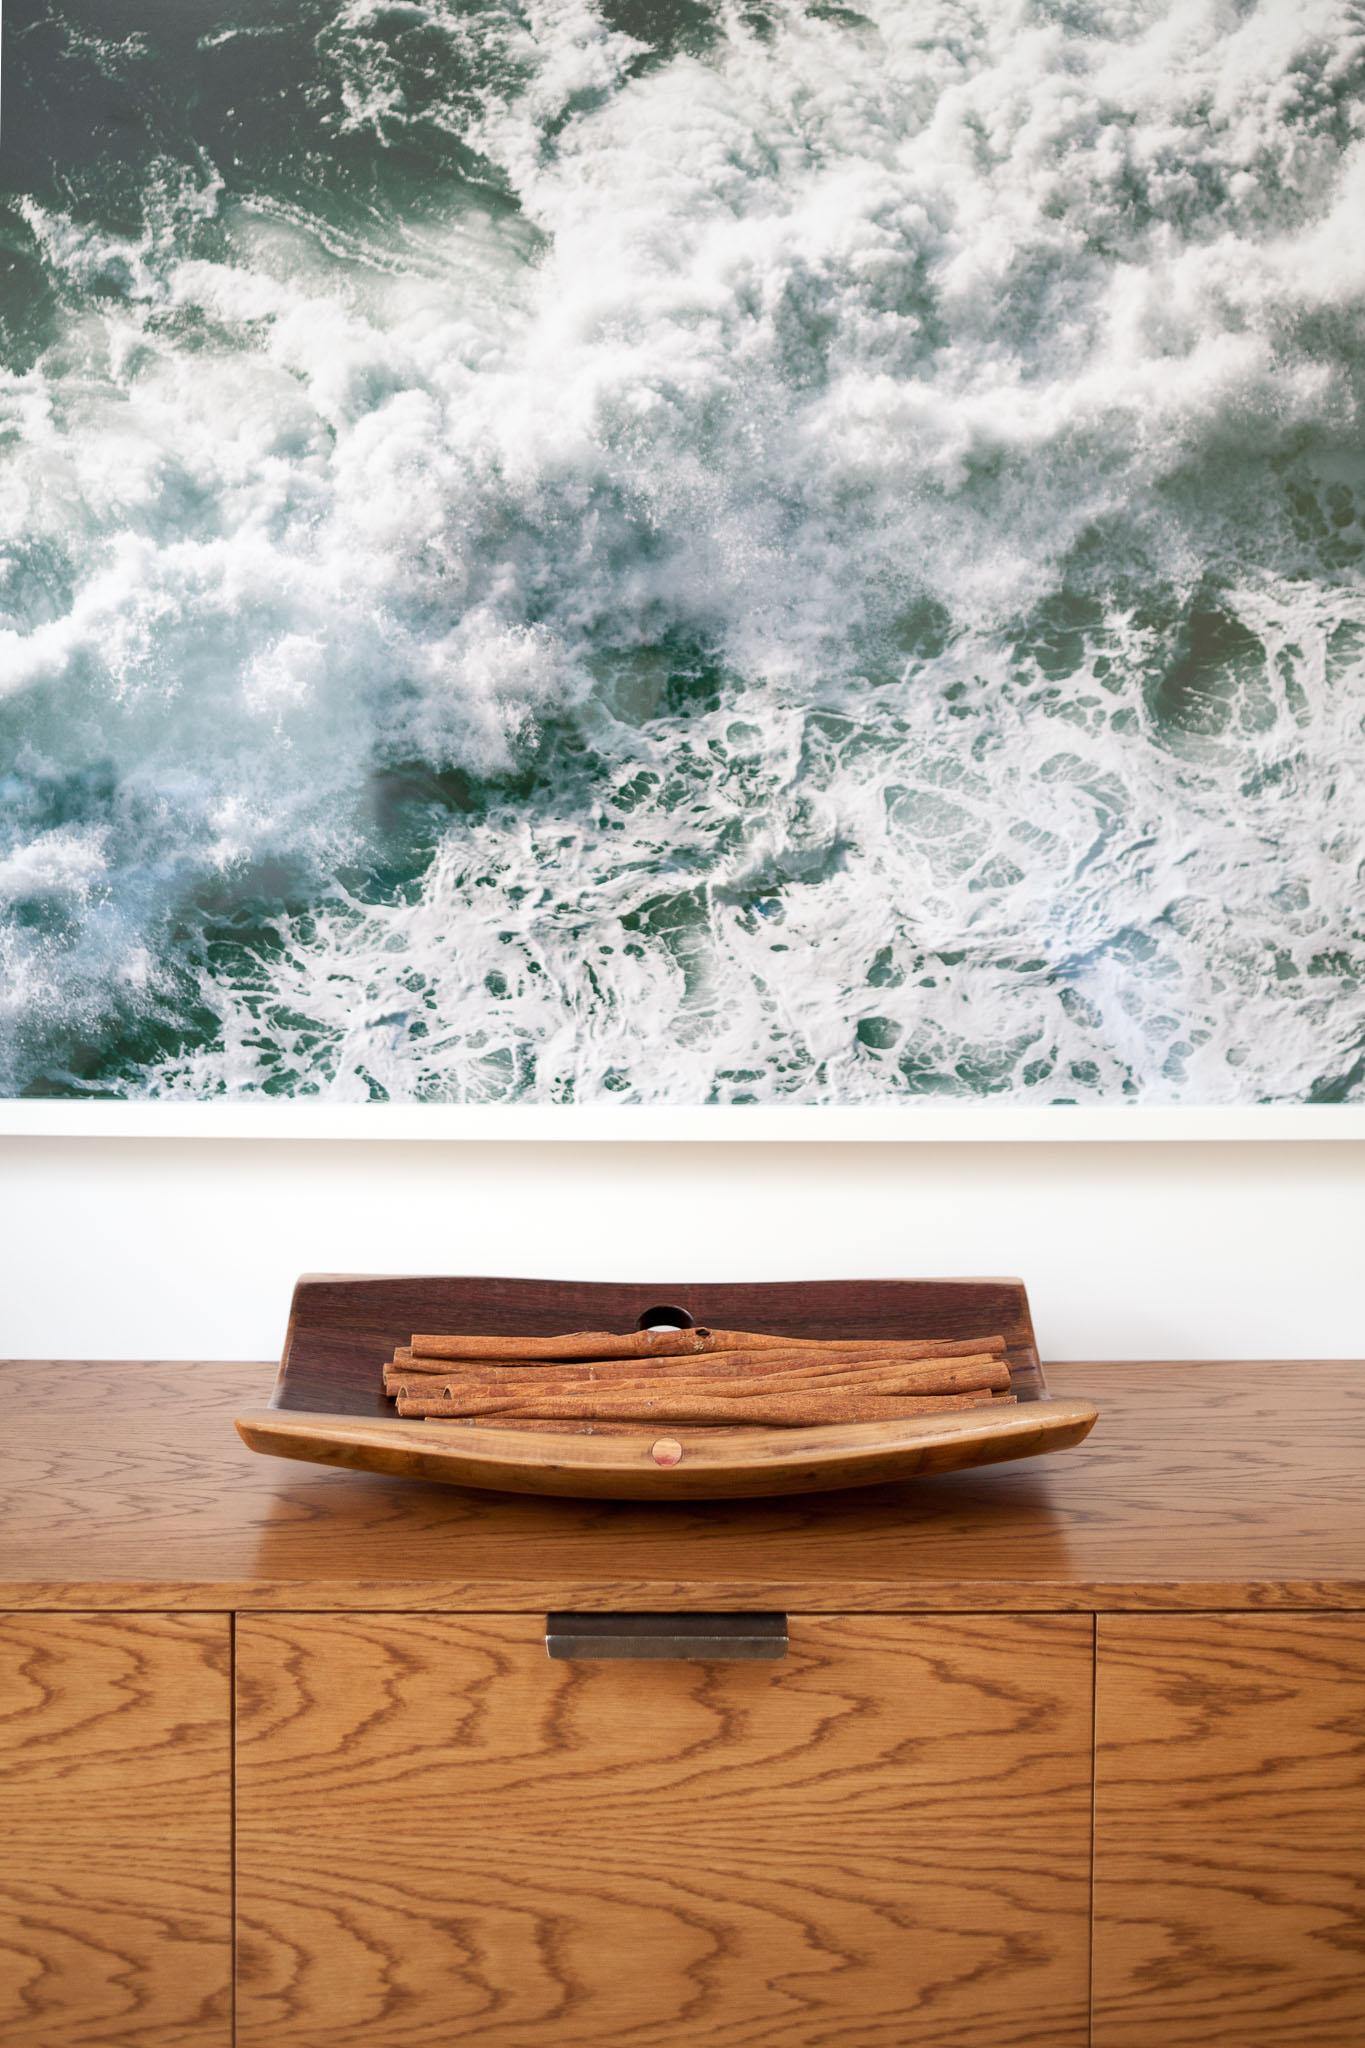 seaside-bungalow-making-waves.jpg